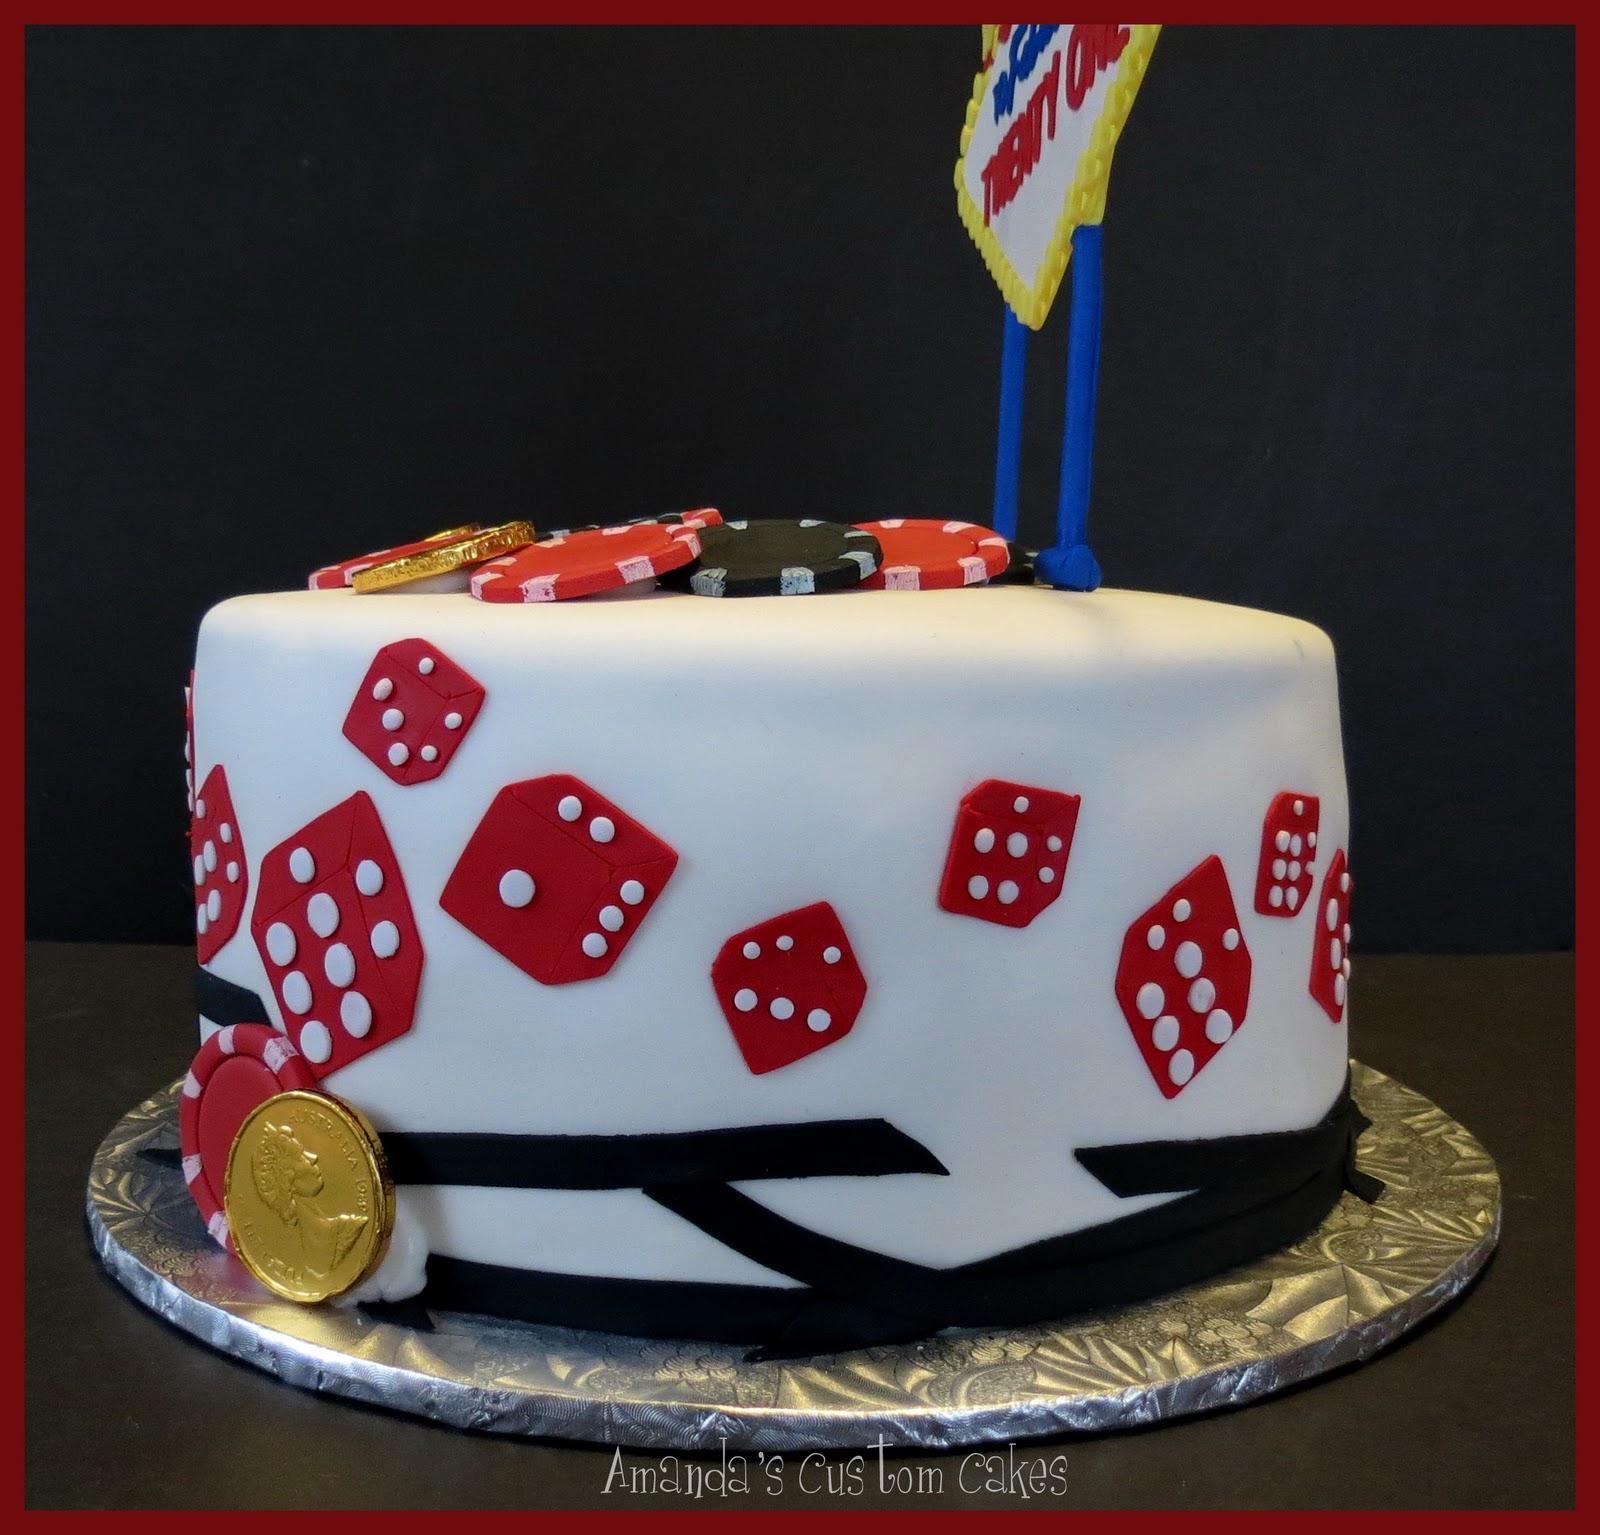 Amanda S Custom Cakes Las Vegas Cake